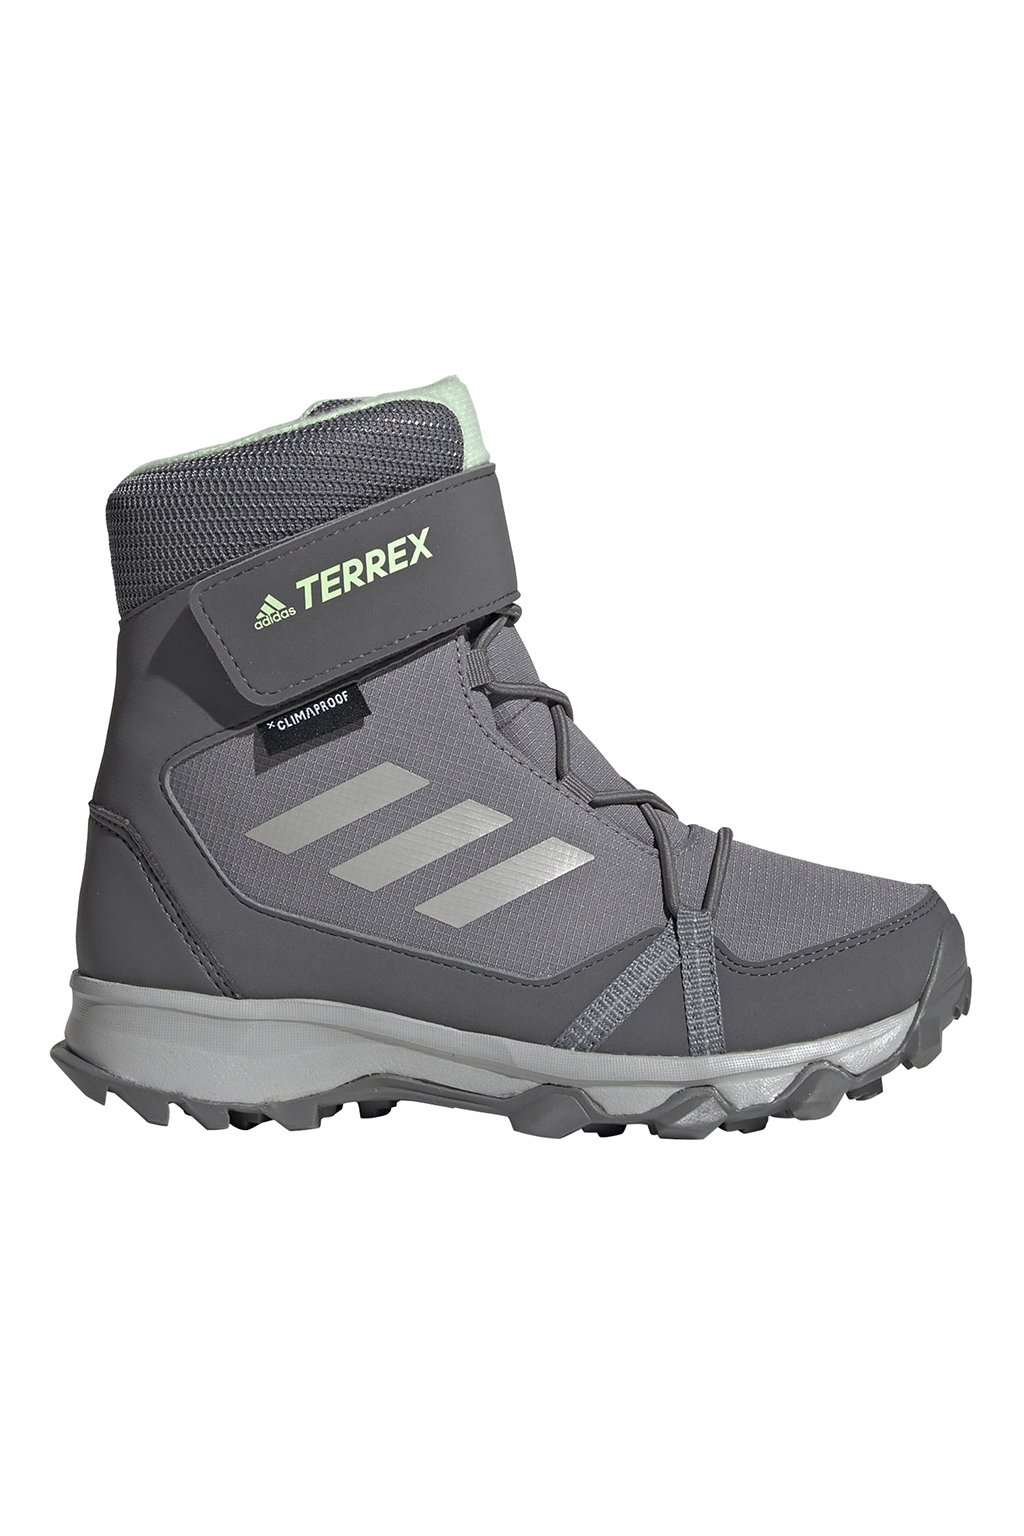 Detská športová obuv adidas Terrex Snow CF R.RDY K sivé G26580